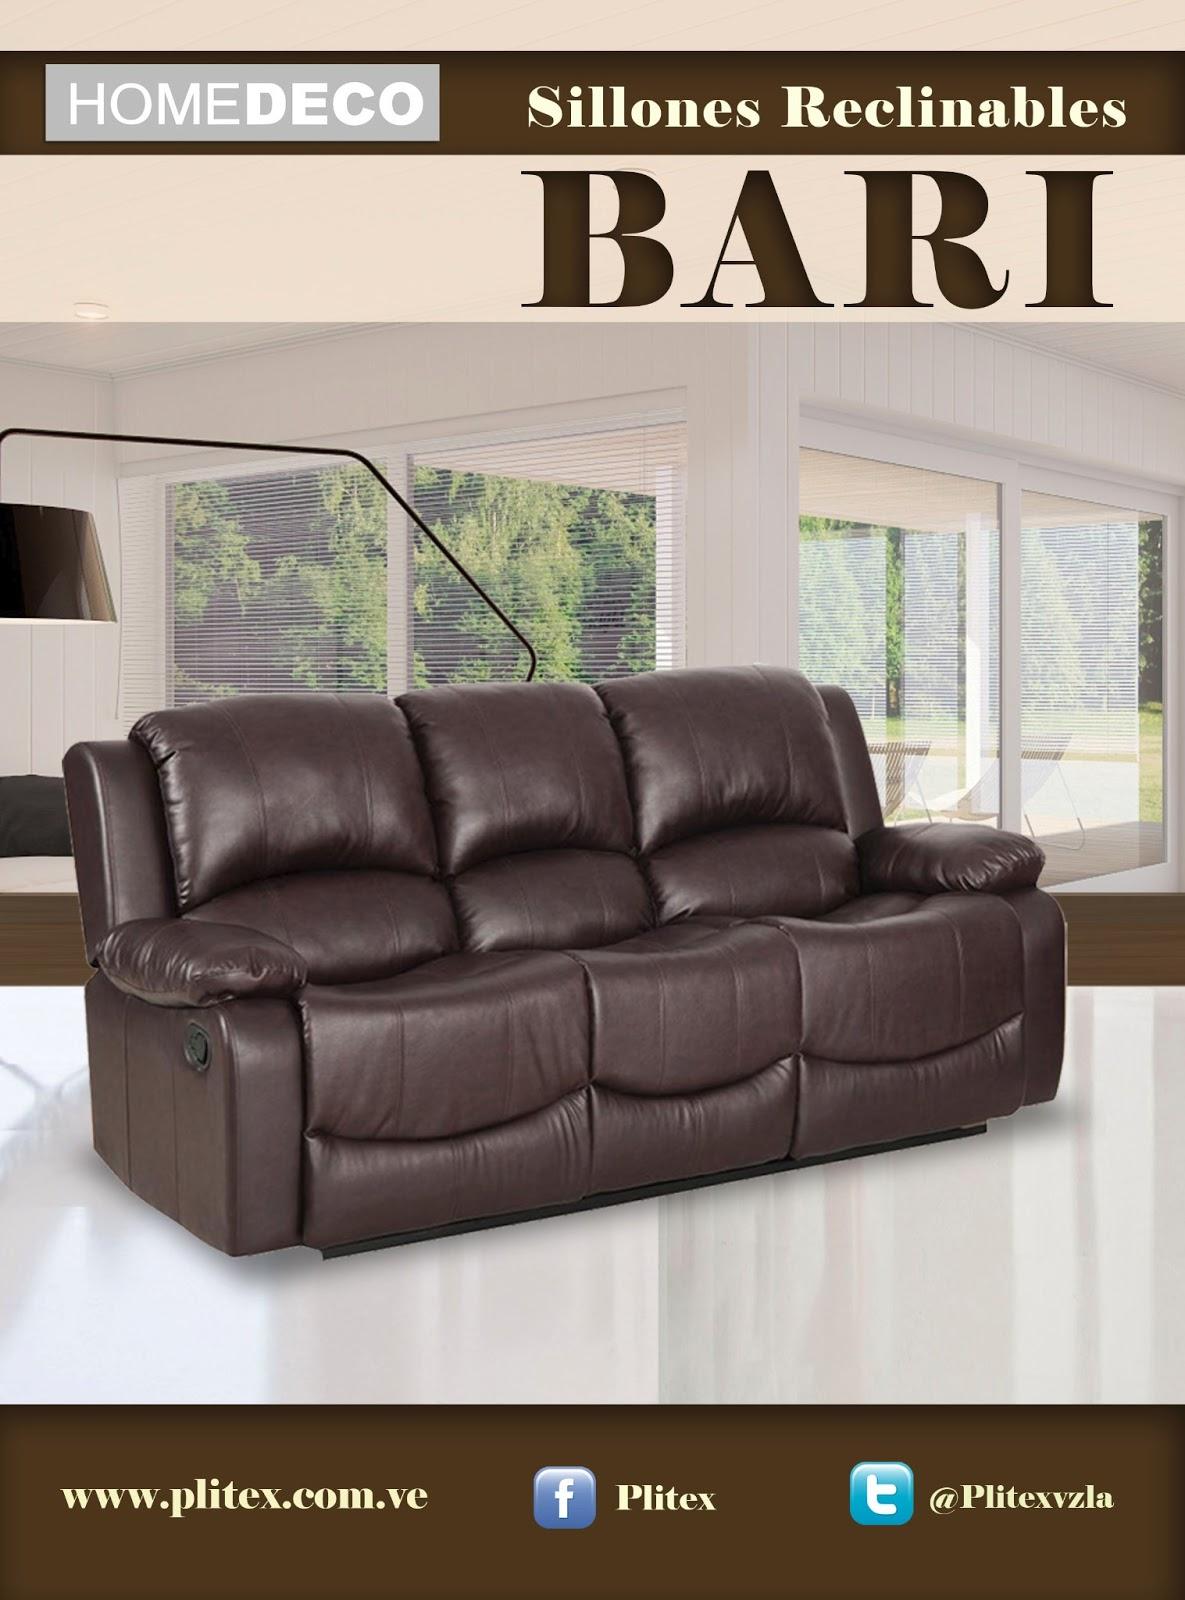 Fabricamos sue os sillones reclinables elegancia y for Sillones reclinables precios